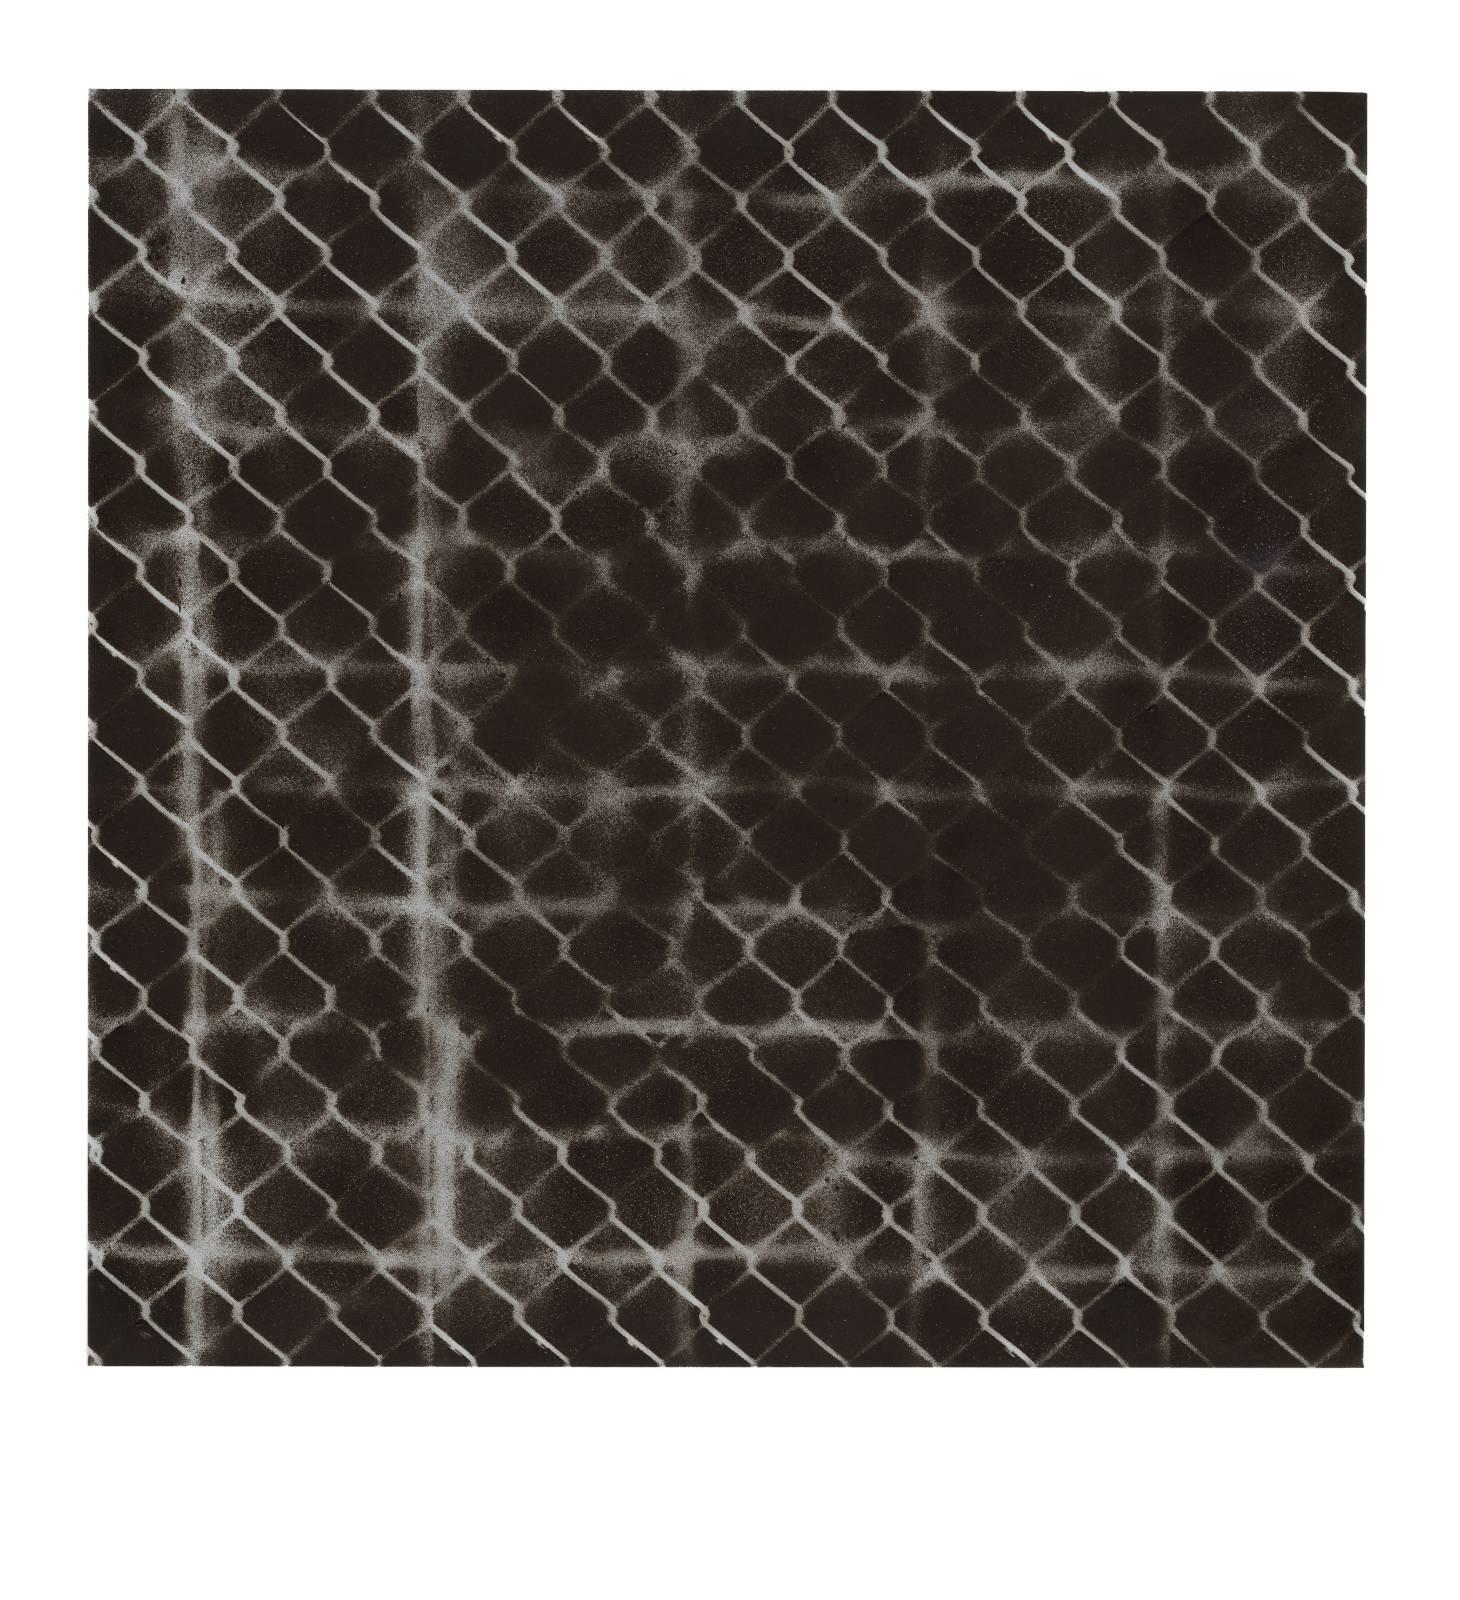 "STAIN : 55°36'50.9""N 13°01'12.6""E, 2016, spraypaint on aluminium, 81,3 x 81,3 cm"